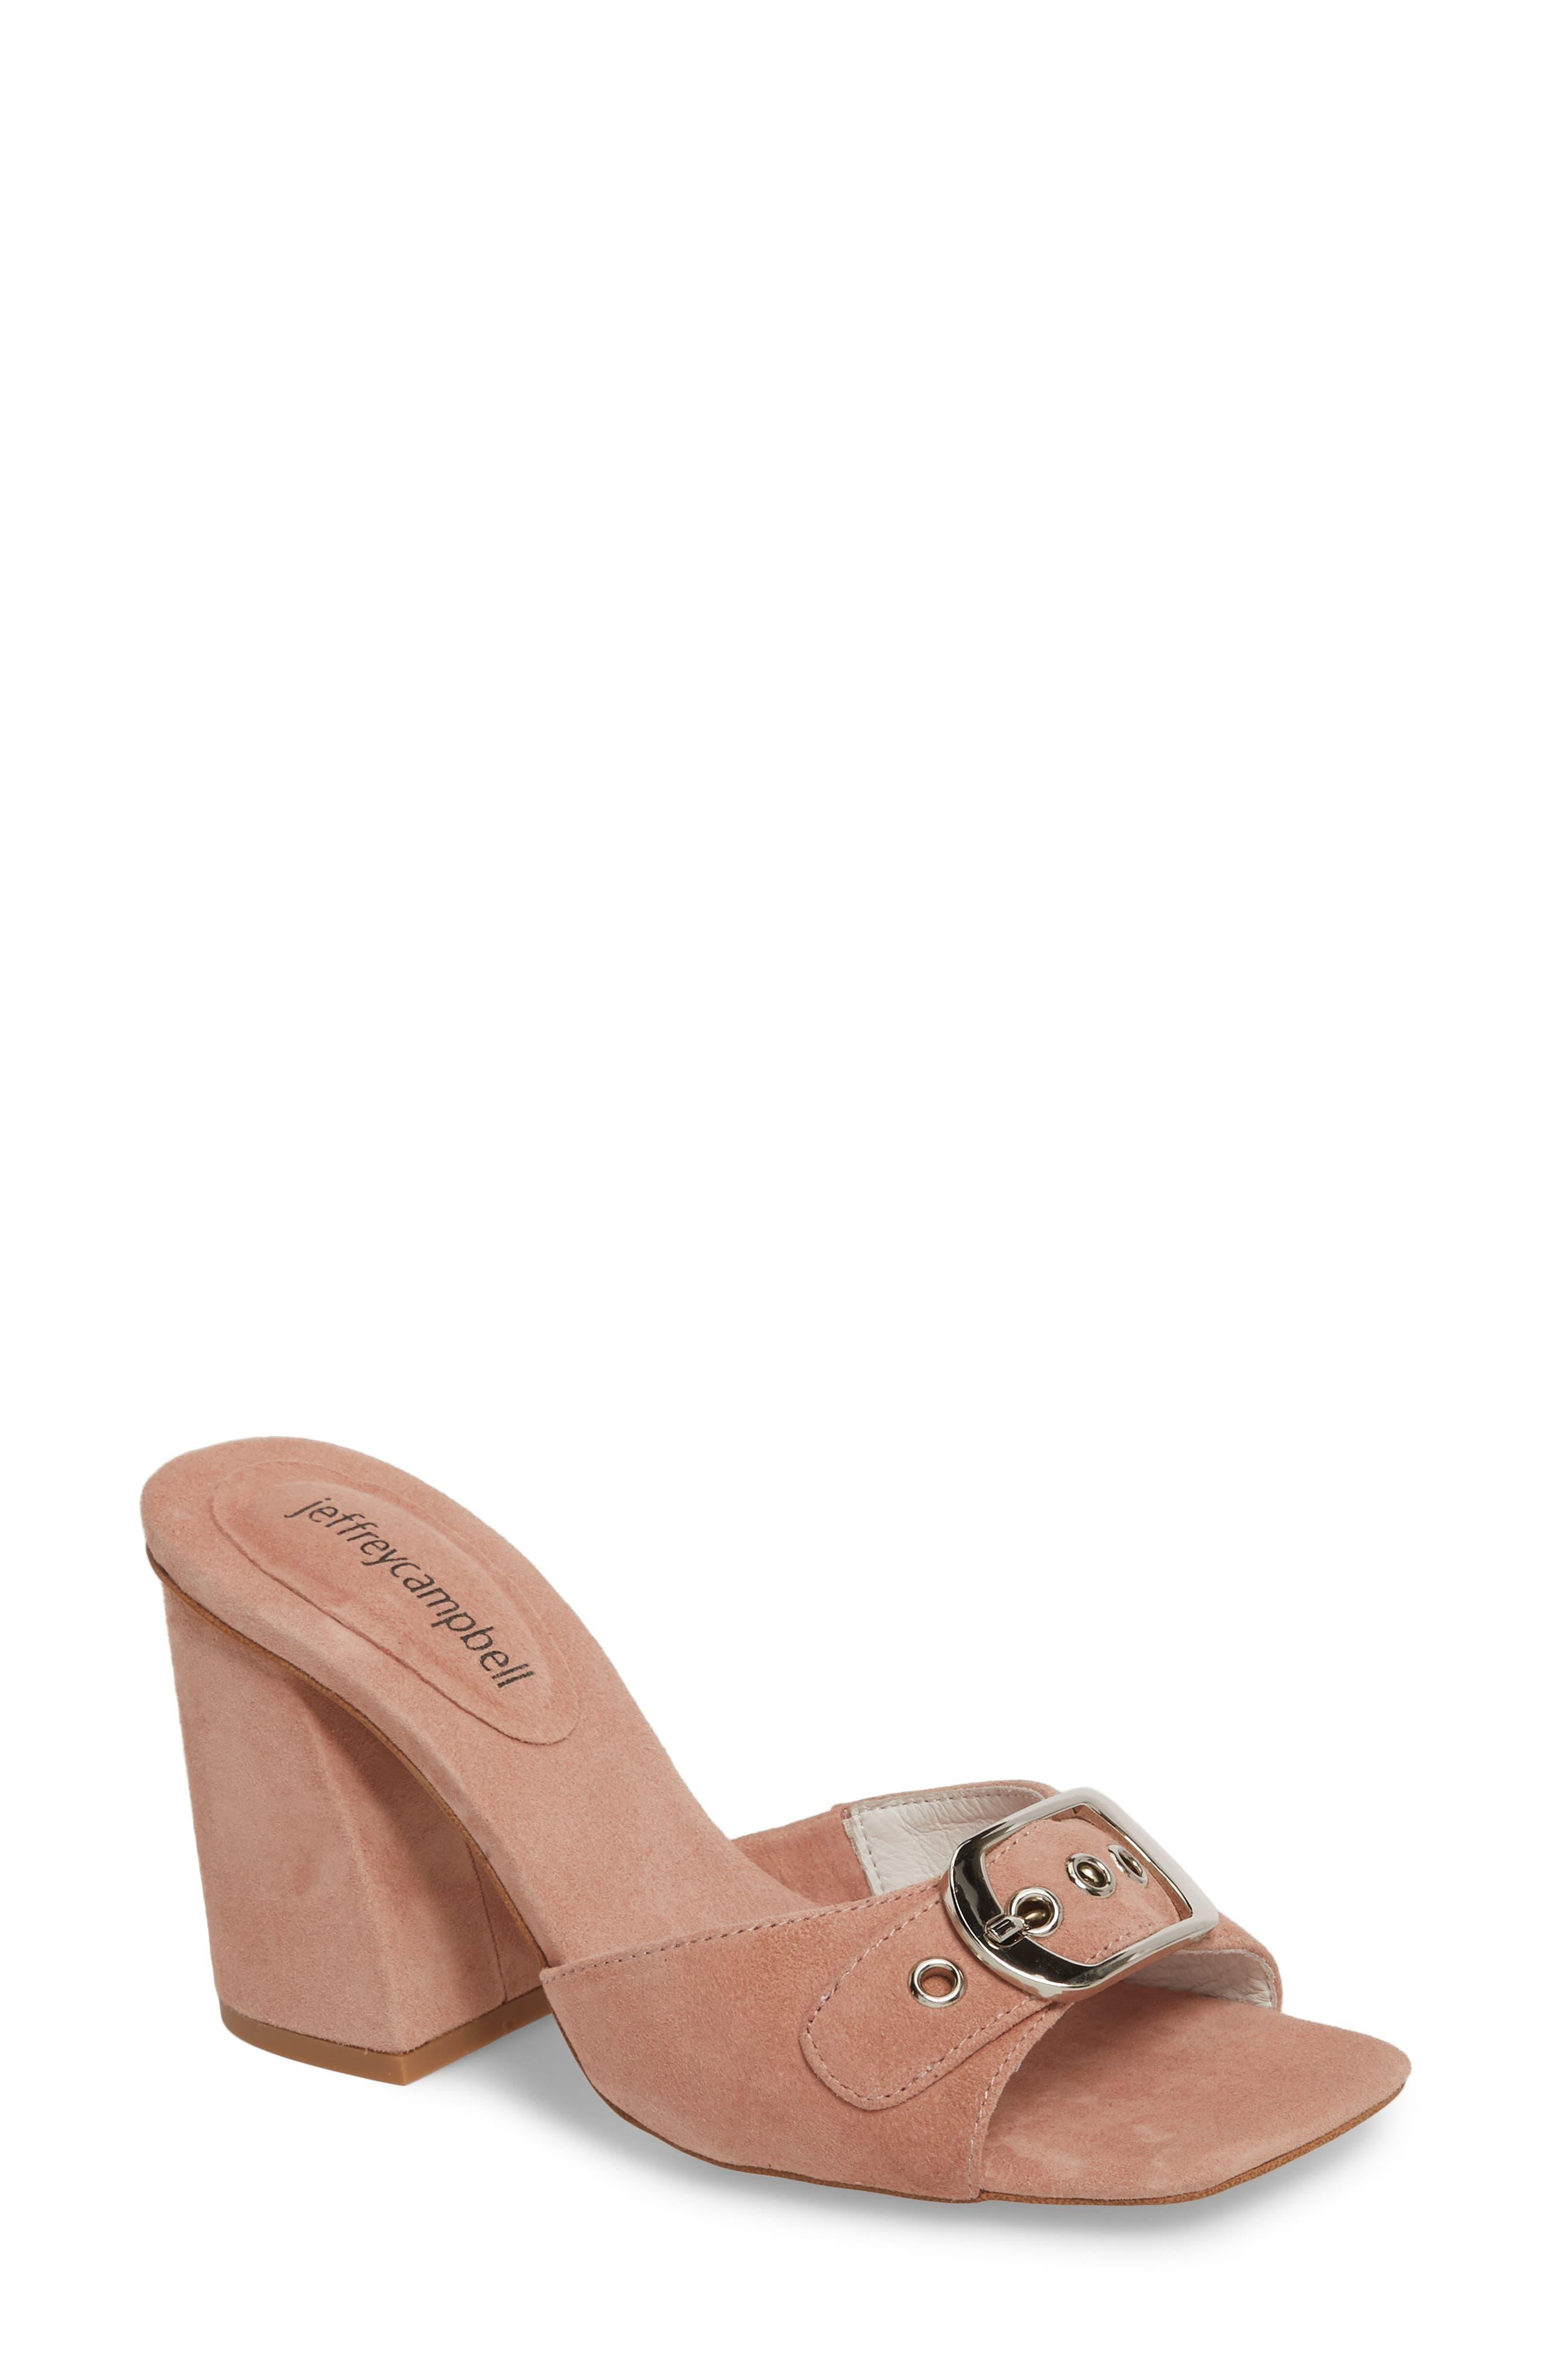 Dub Buckle Sandal,                         Main,                         color, Blush Suede/ Silver